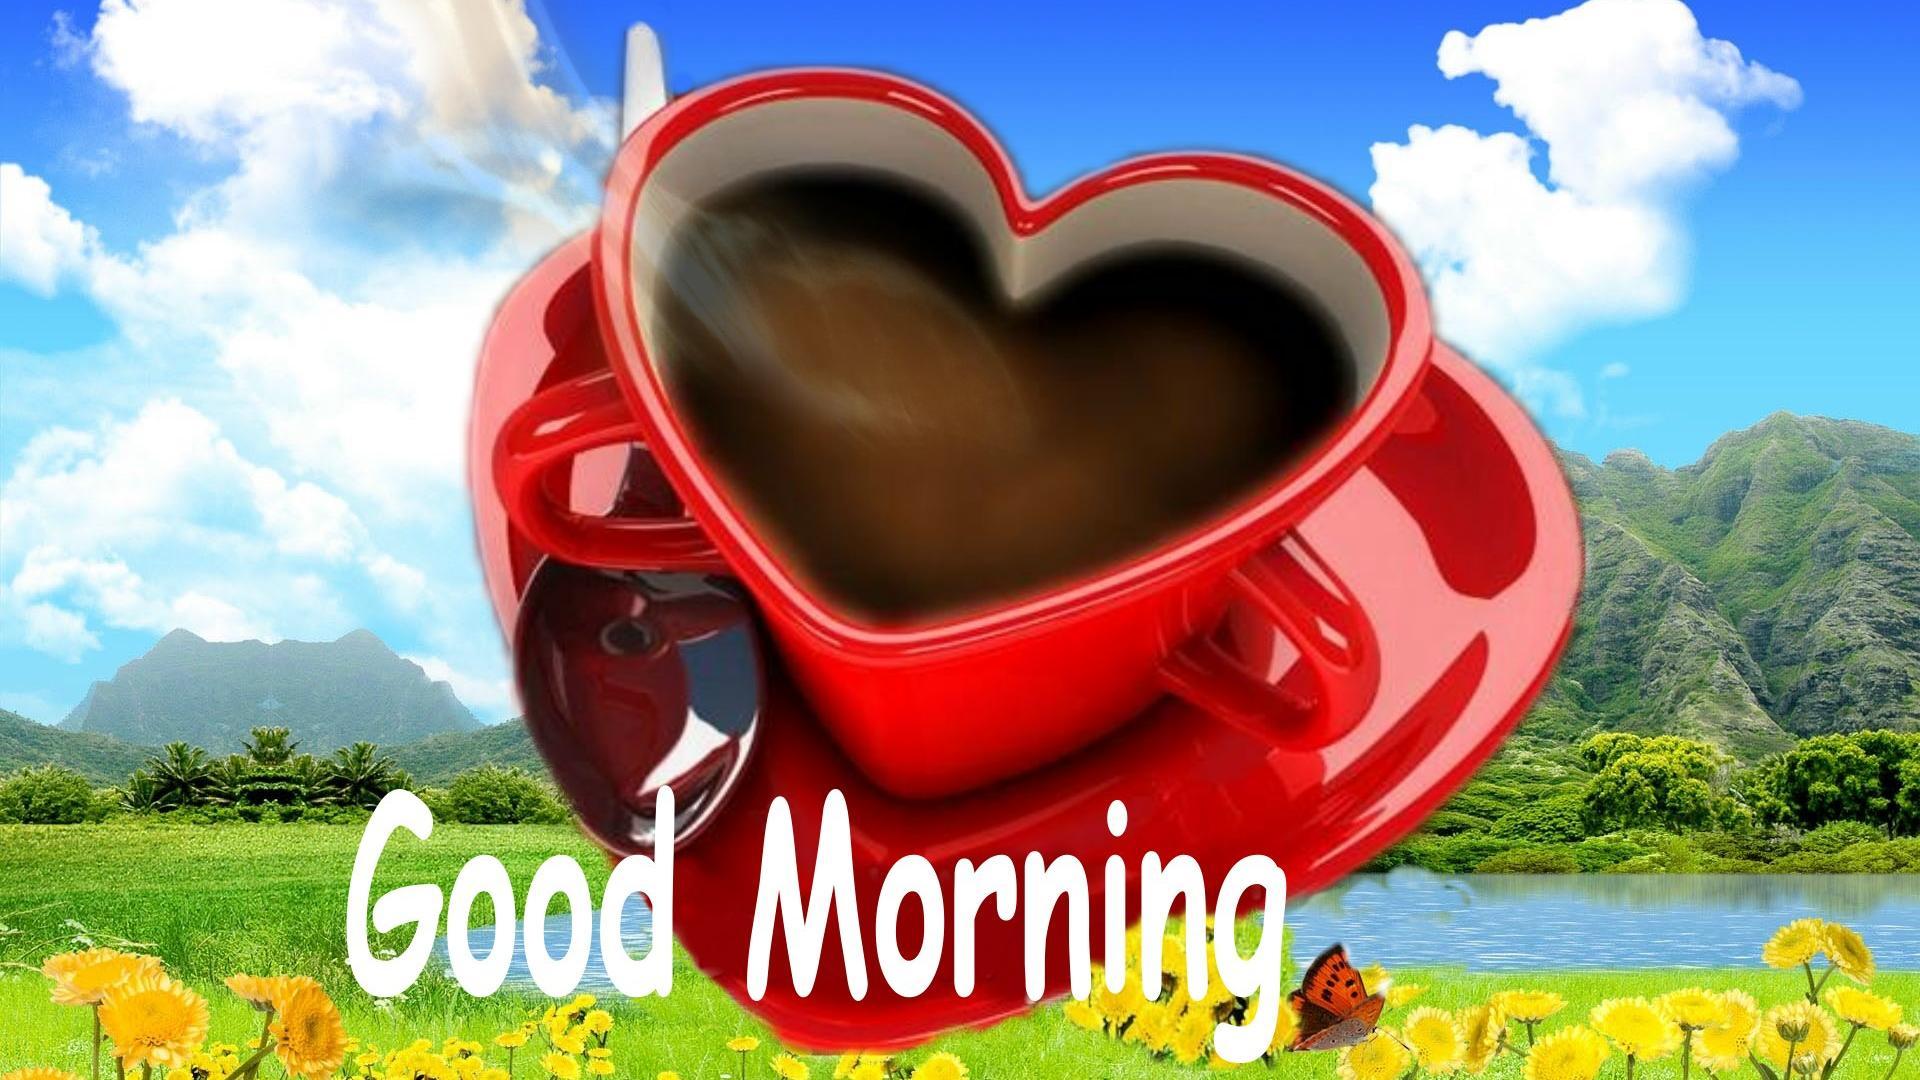 Wallpaper download good morning - Love Good Morning Images Hd Wallpaper Of Greeting Hdwallpaper2013